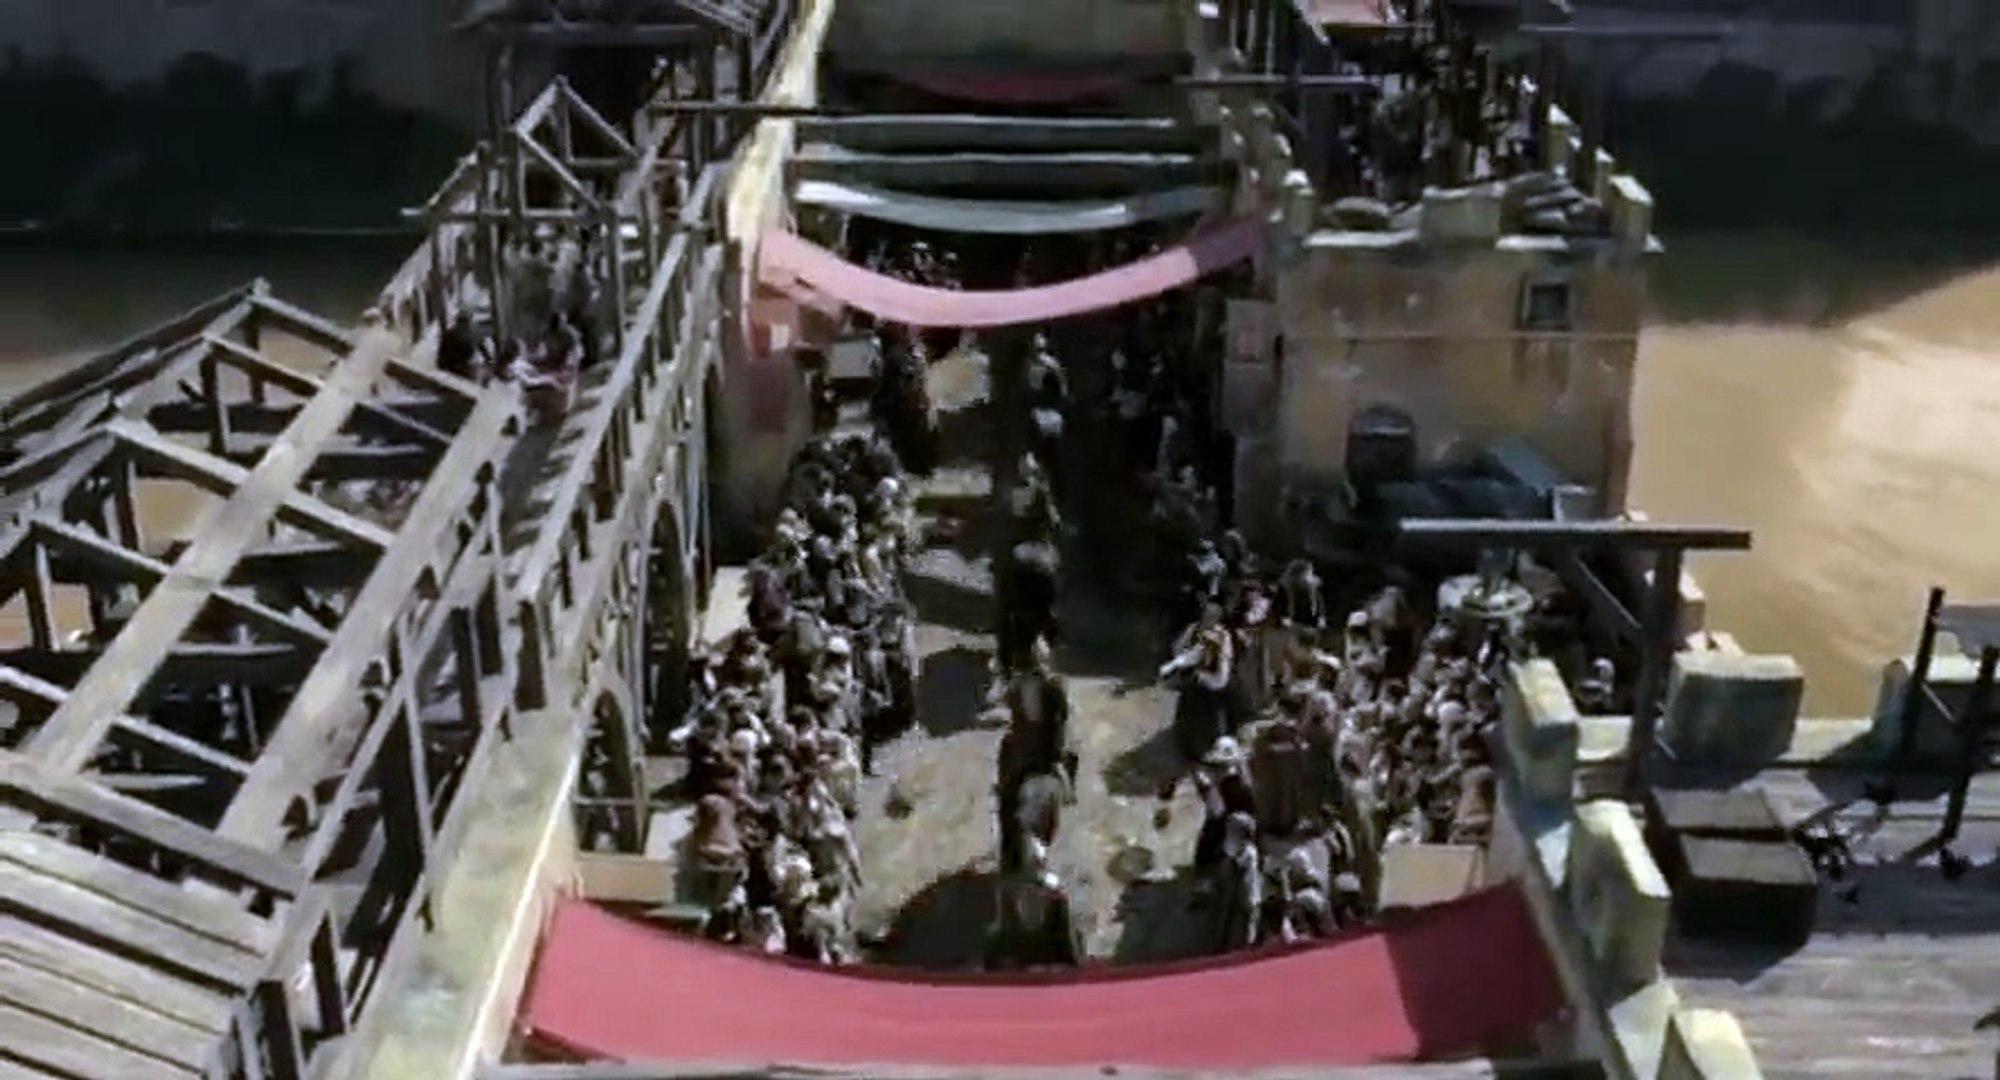 Da Vinci's Demons S02 - Ep01 The Blo'od of Man - Part 01 HD Watch